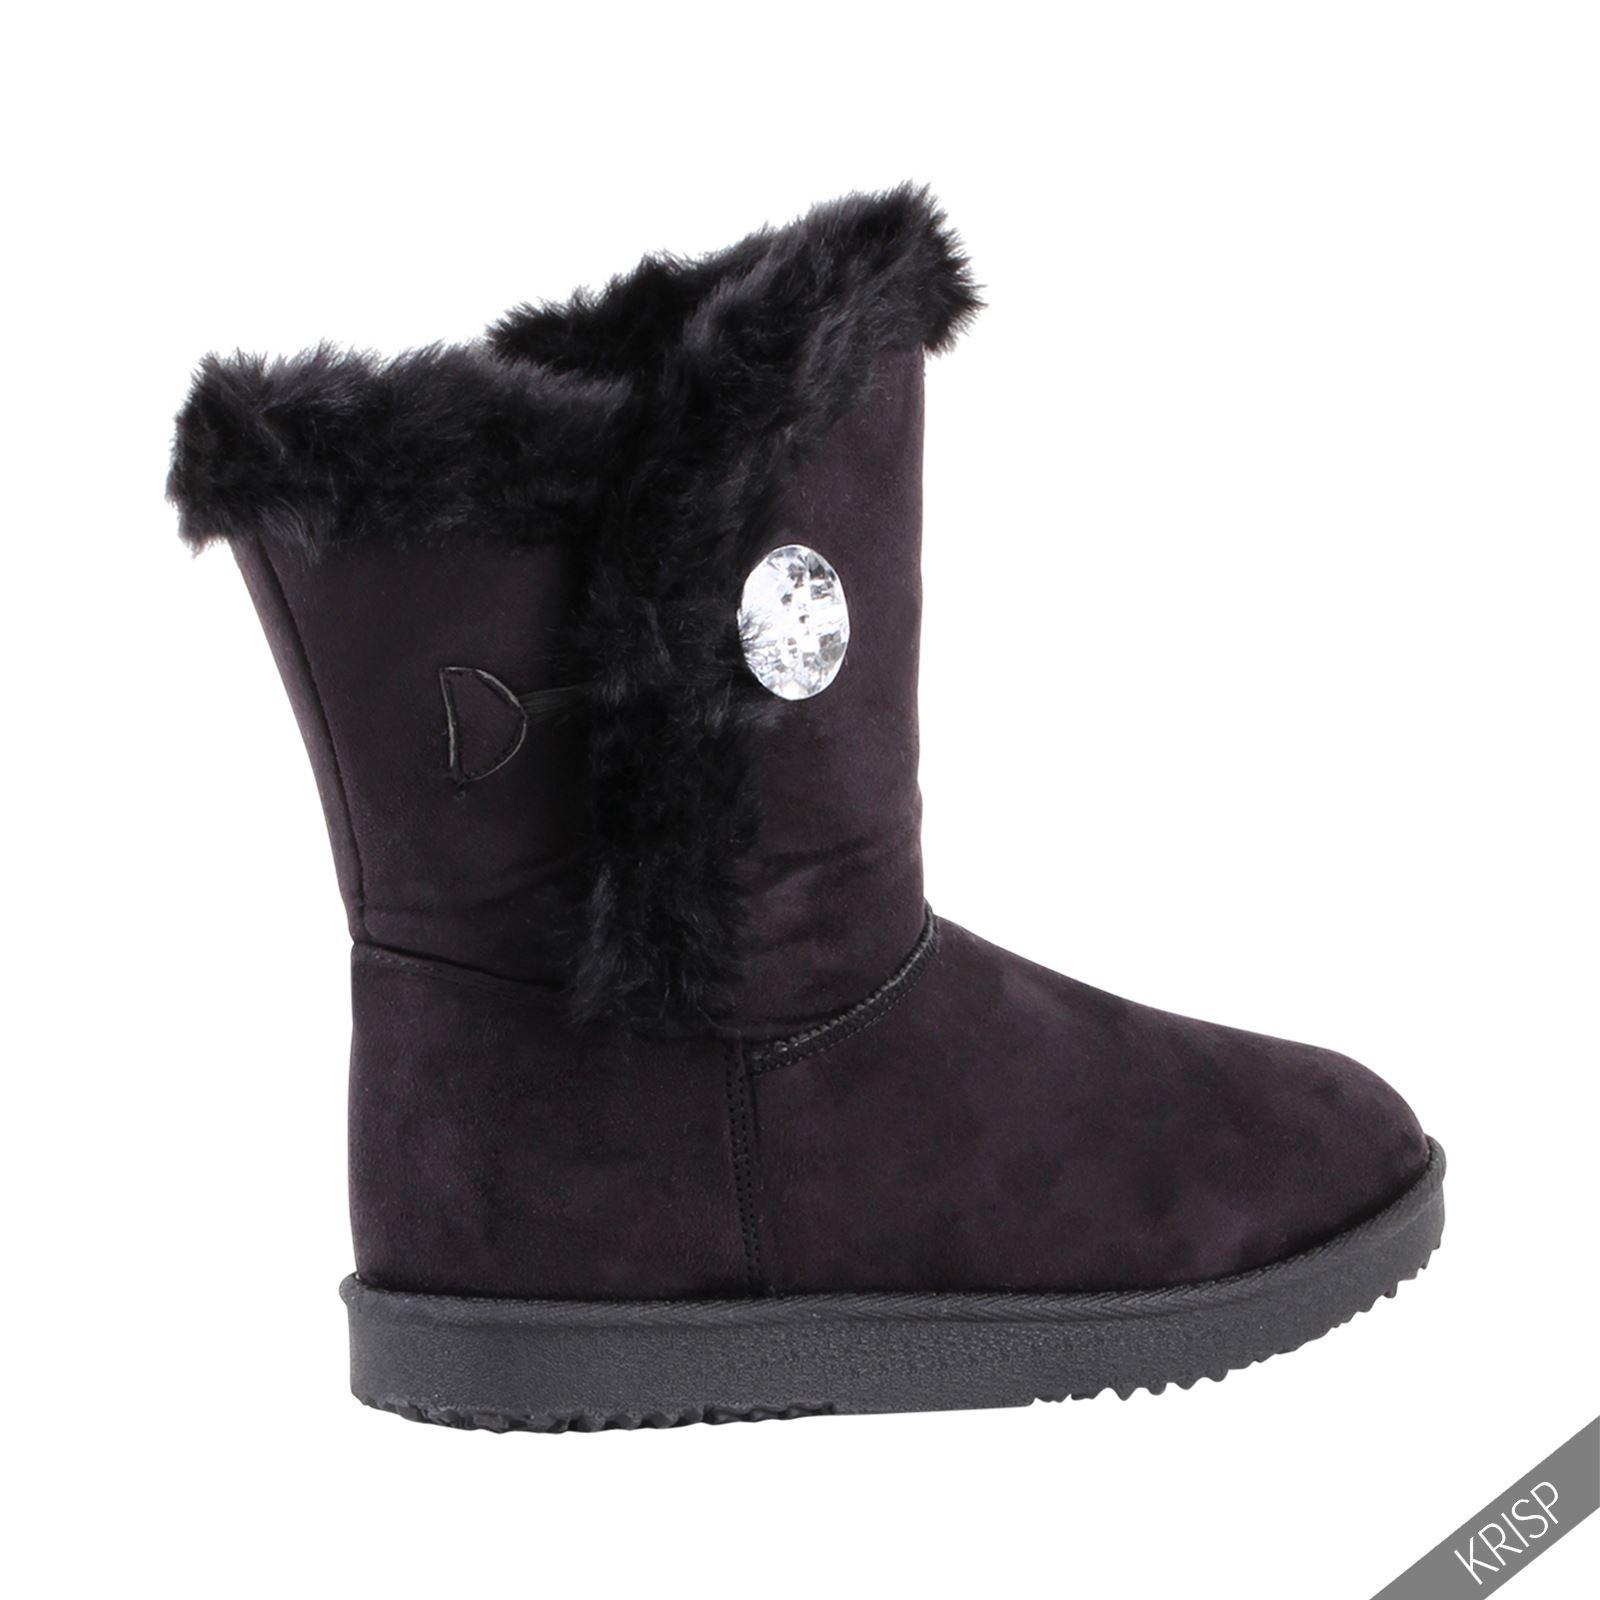 Womens-Fur-Lined-Short-Mini-Snug-Ankle-Calf-Boots-Flat-Ladies-Winter-Shoes-Snow